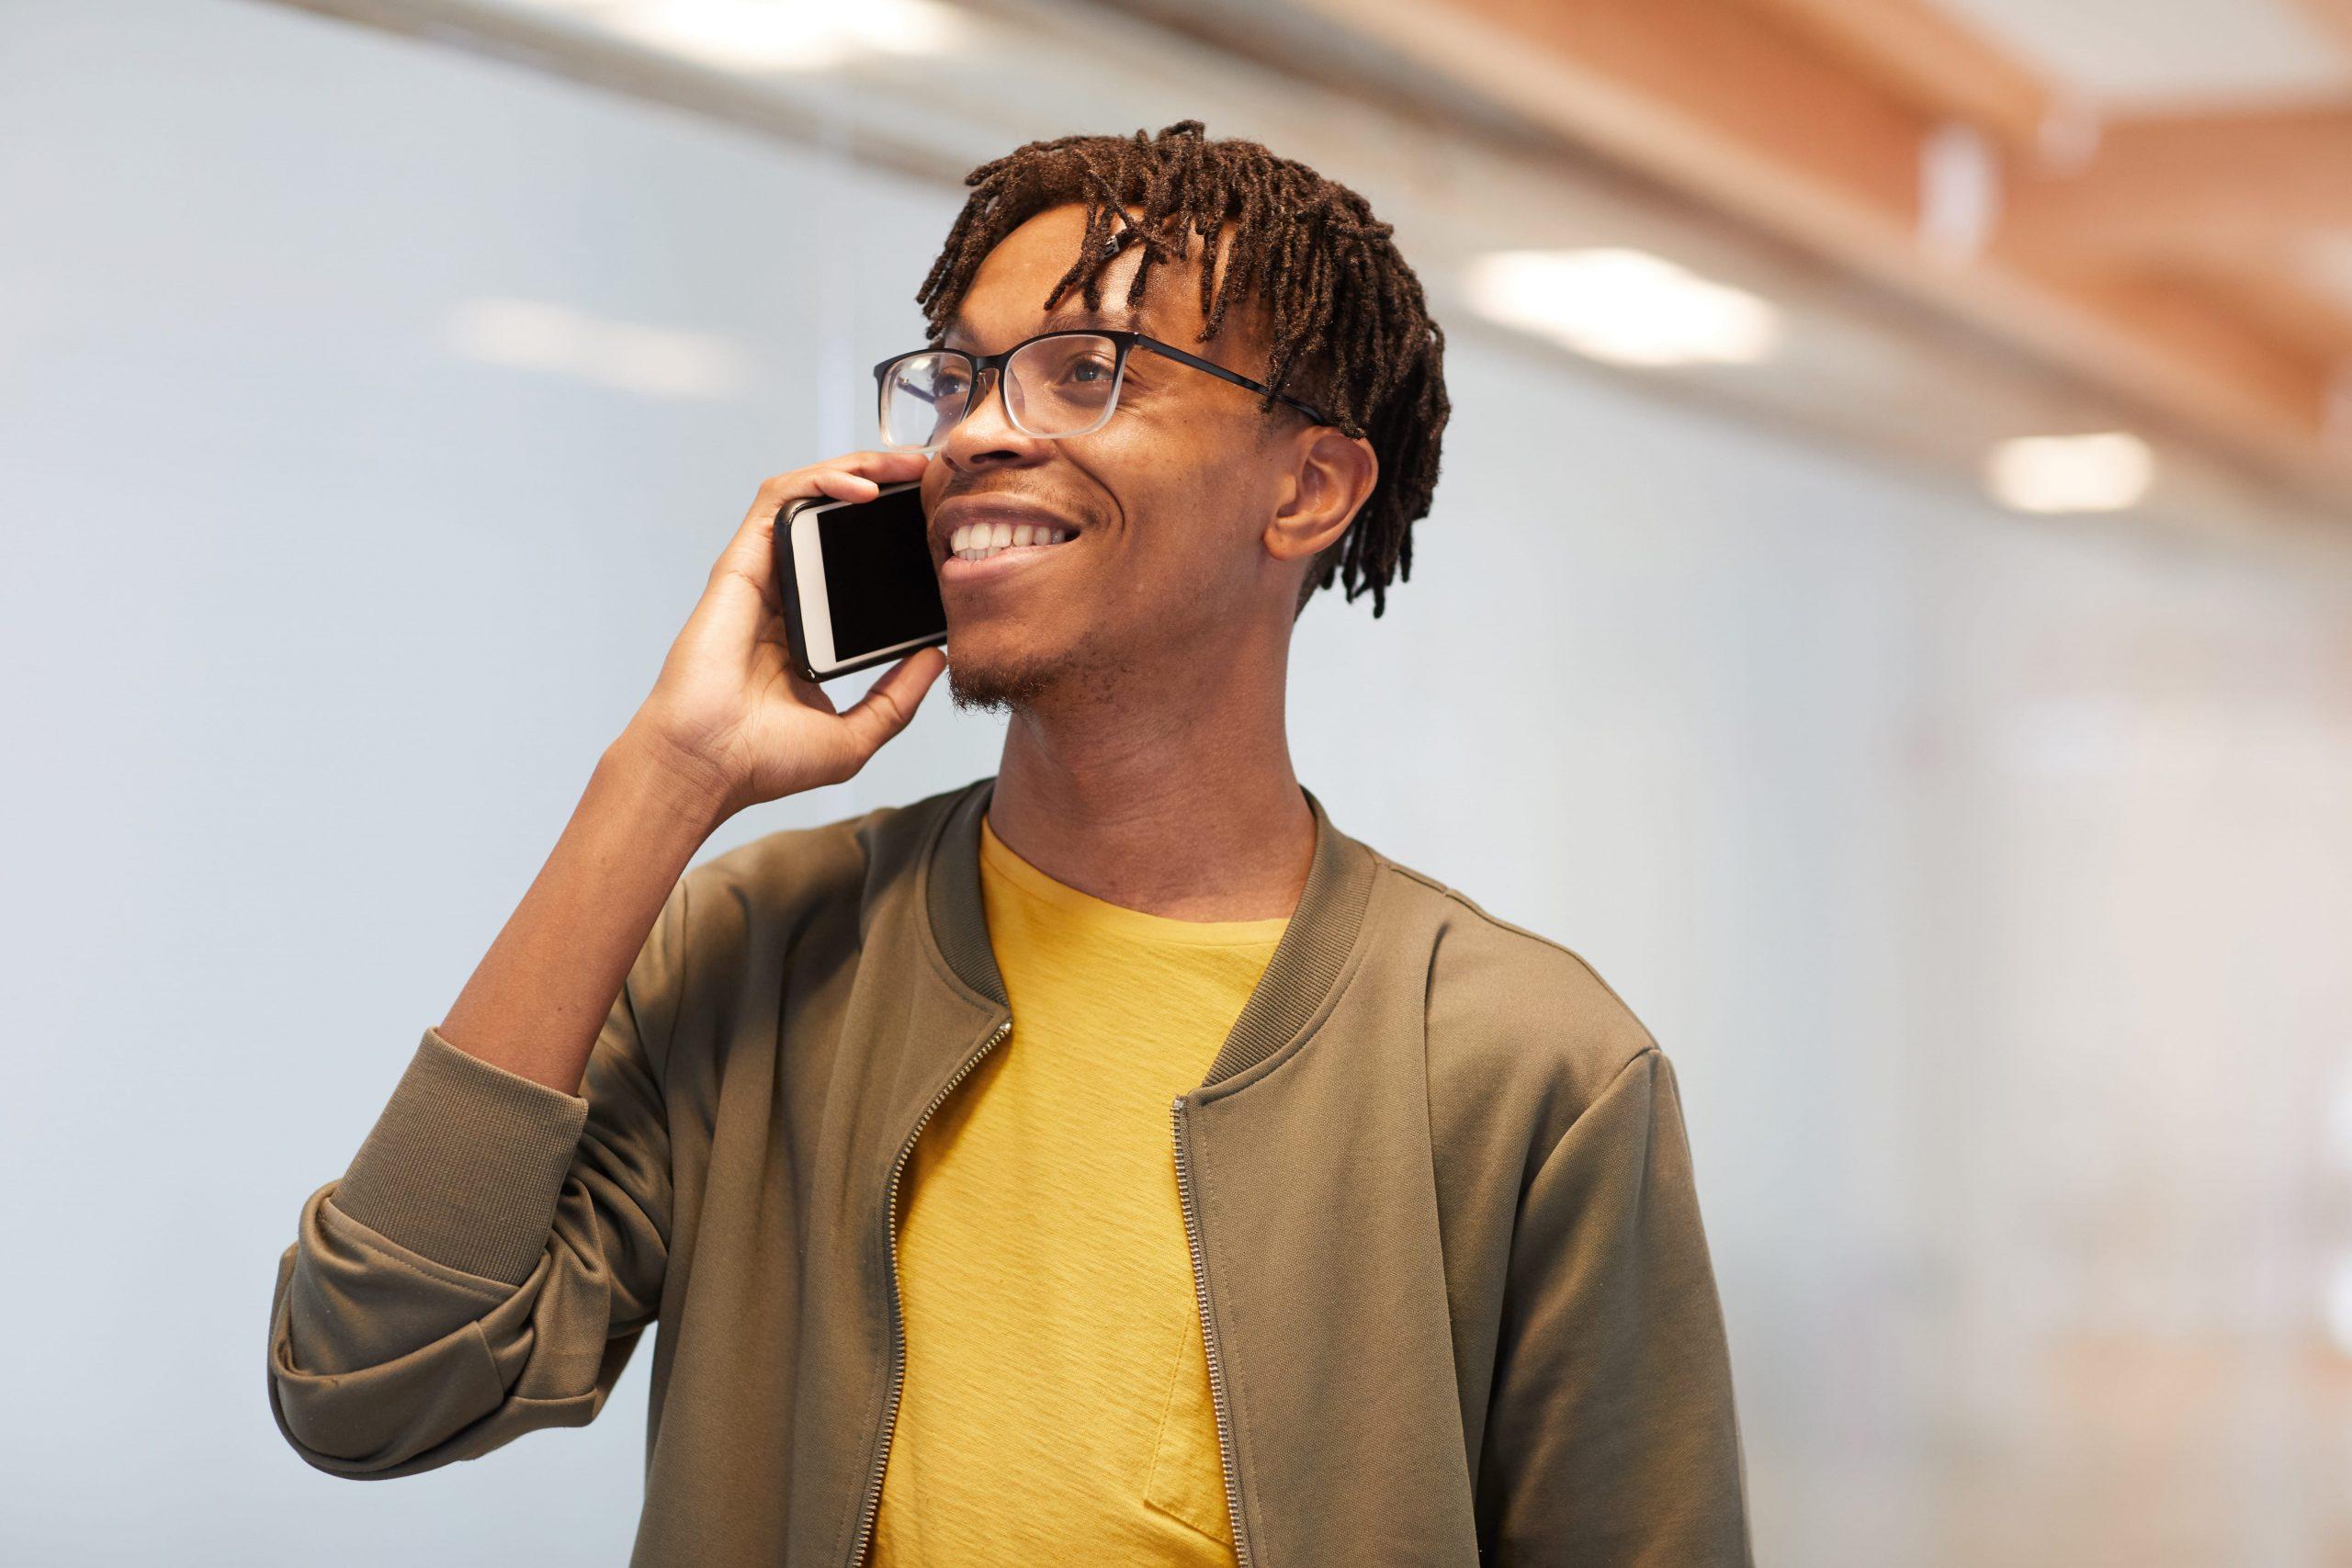 Conheça o módulo de Telefonia da plataforma NeoAssist NeoAssist